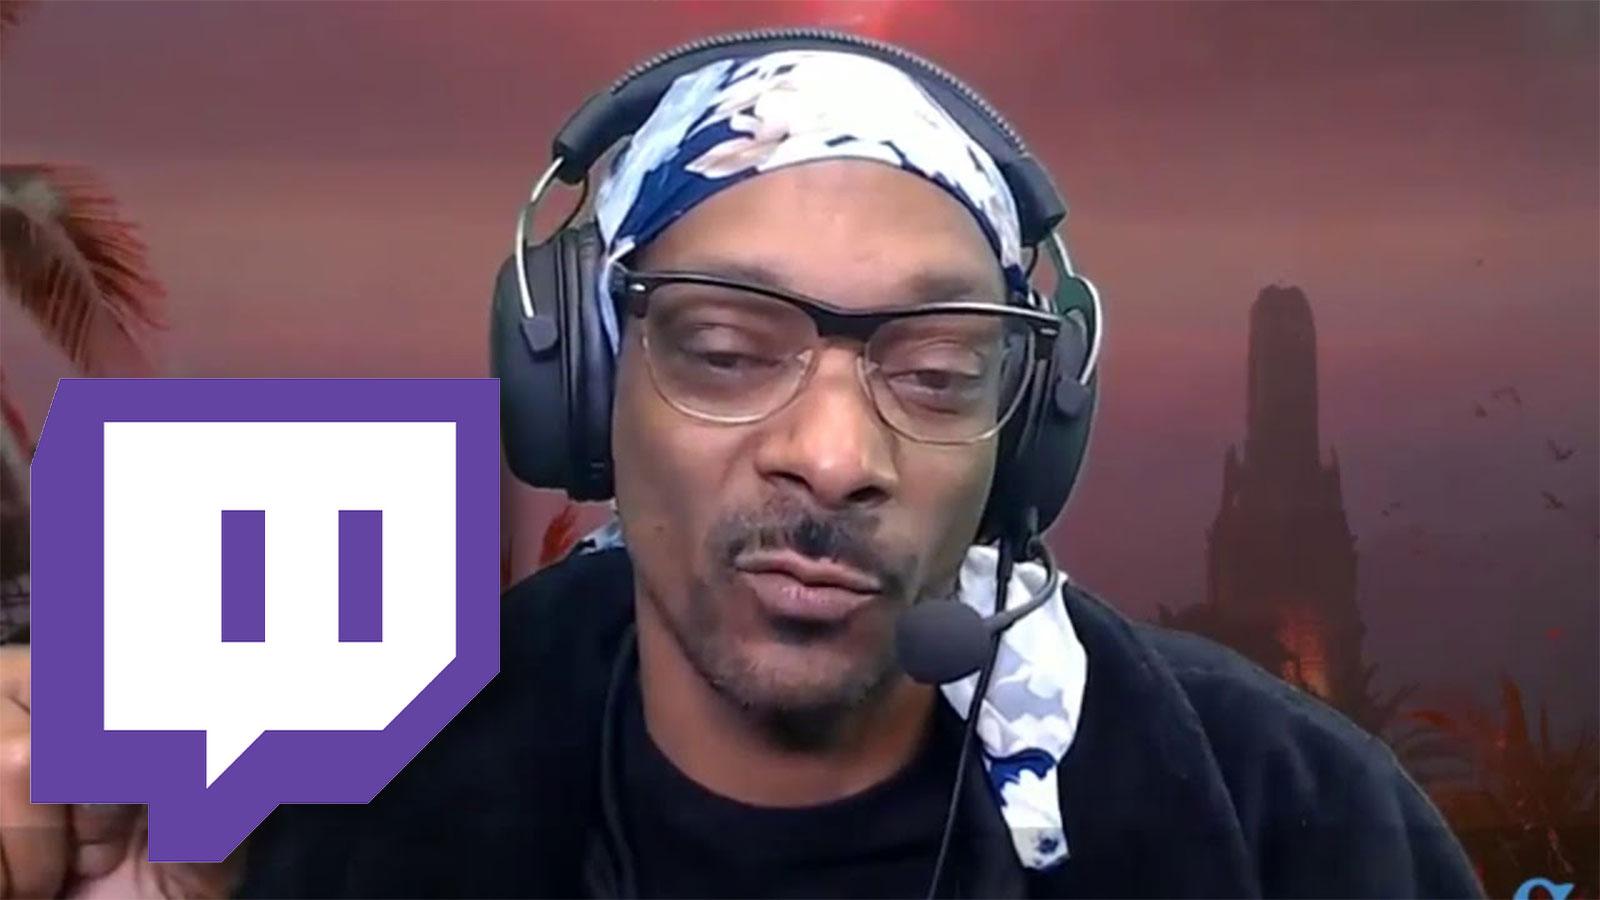 Snoop Dogg on twitch.com